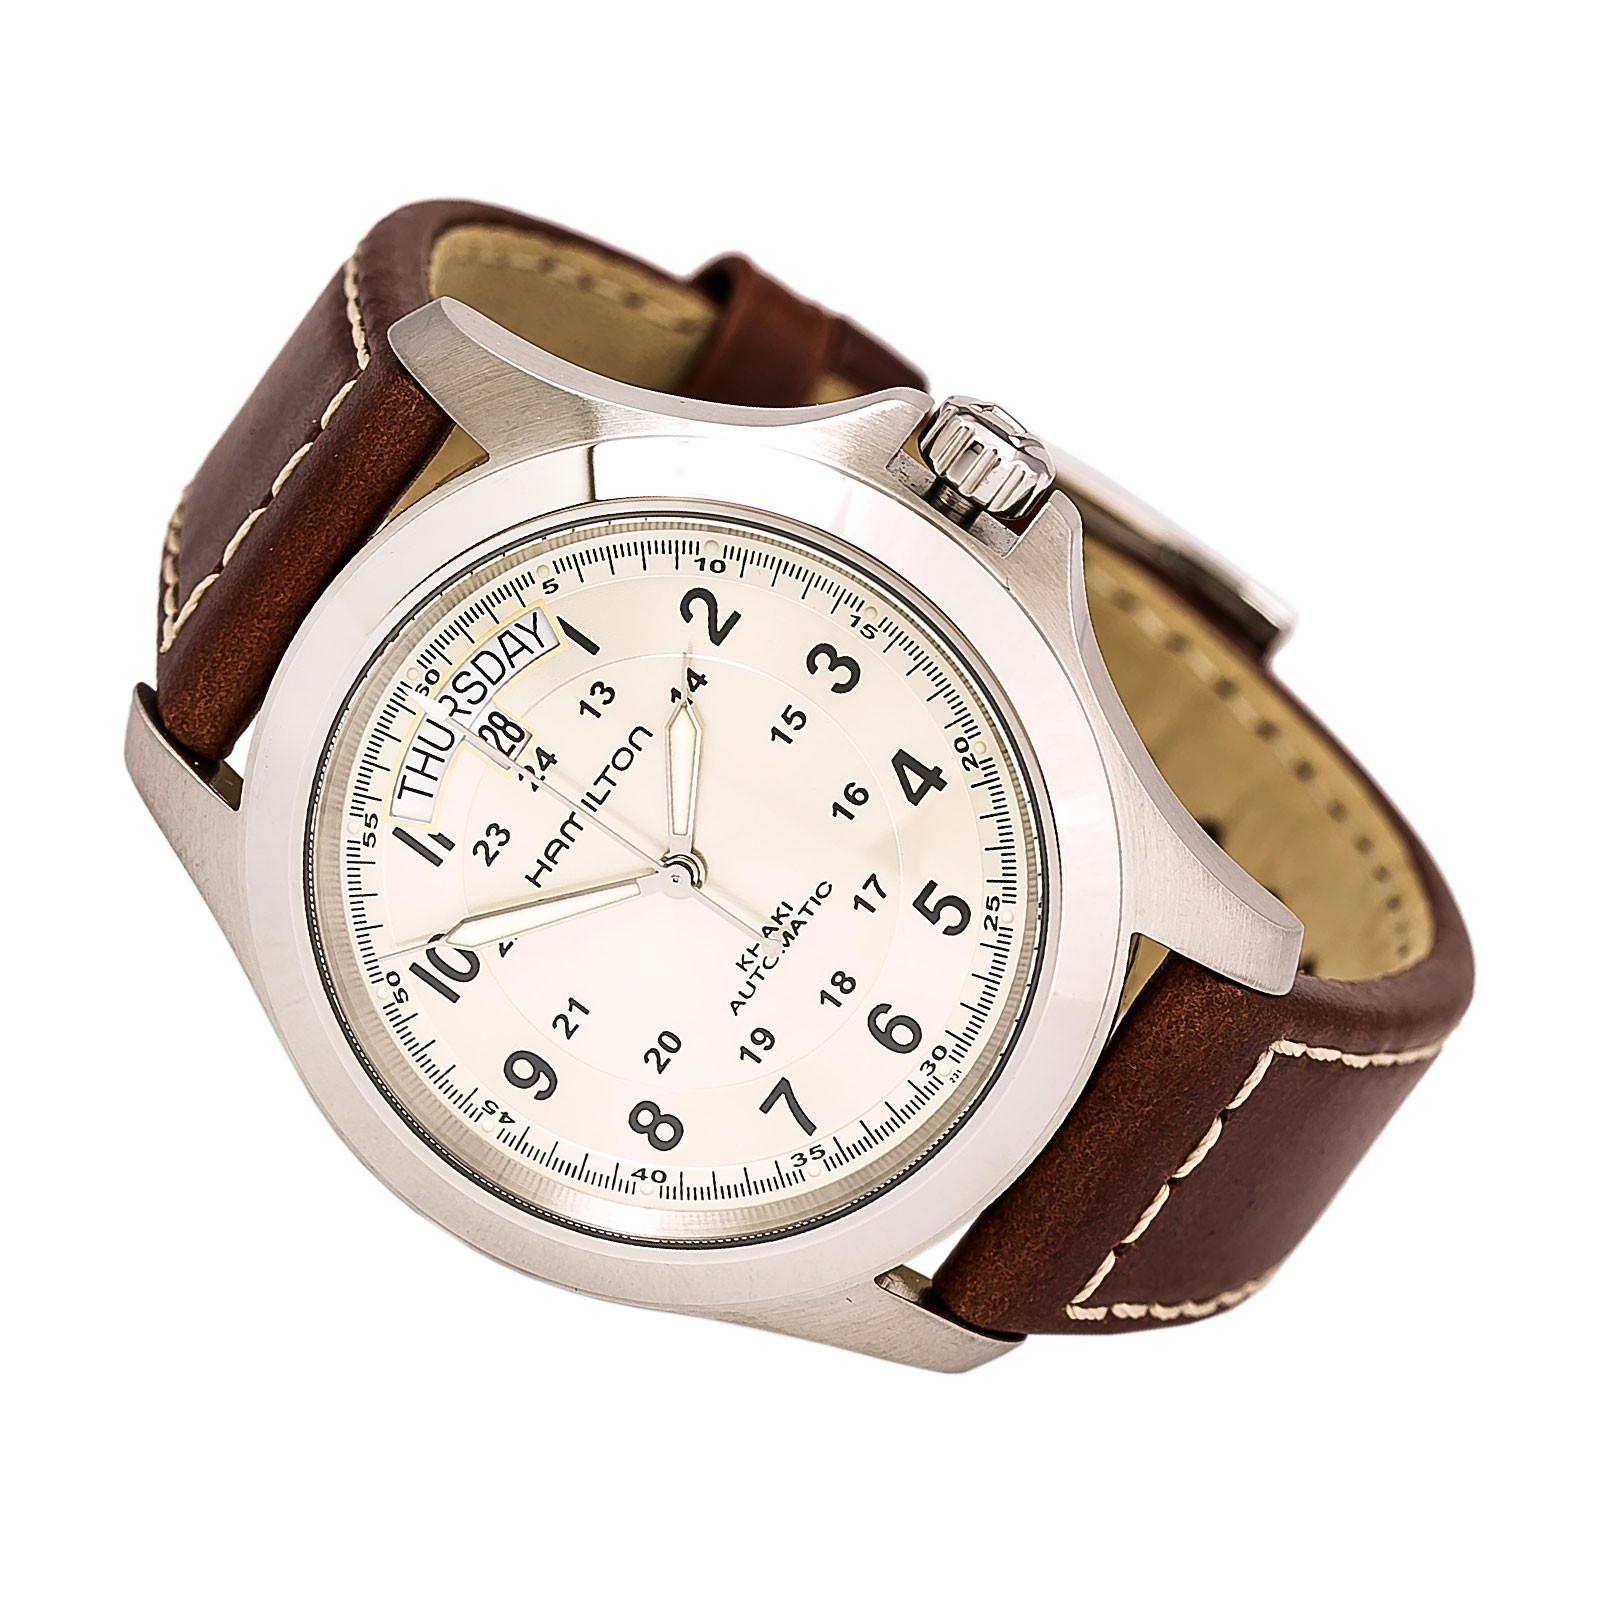 Hamilton H64455523 Khaki Field King Automatic Watch Review